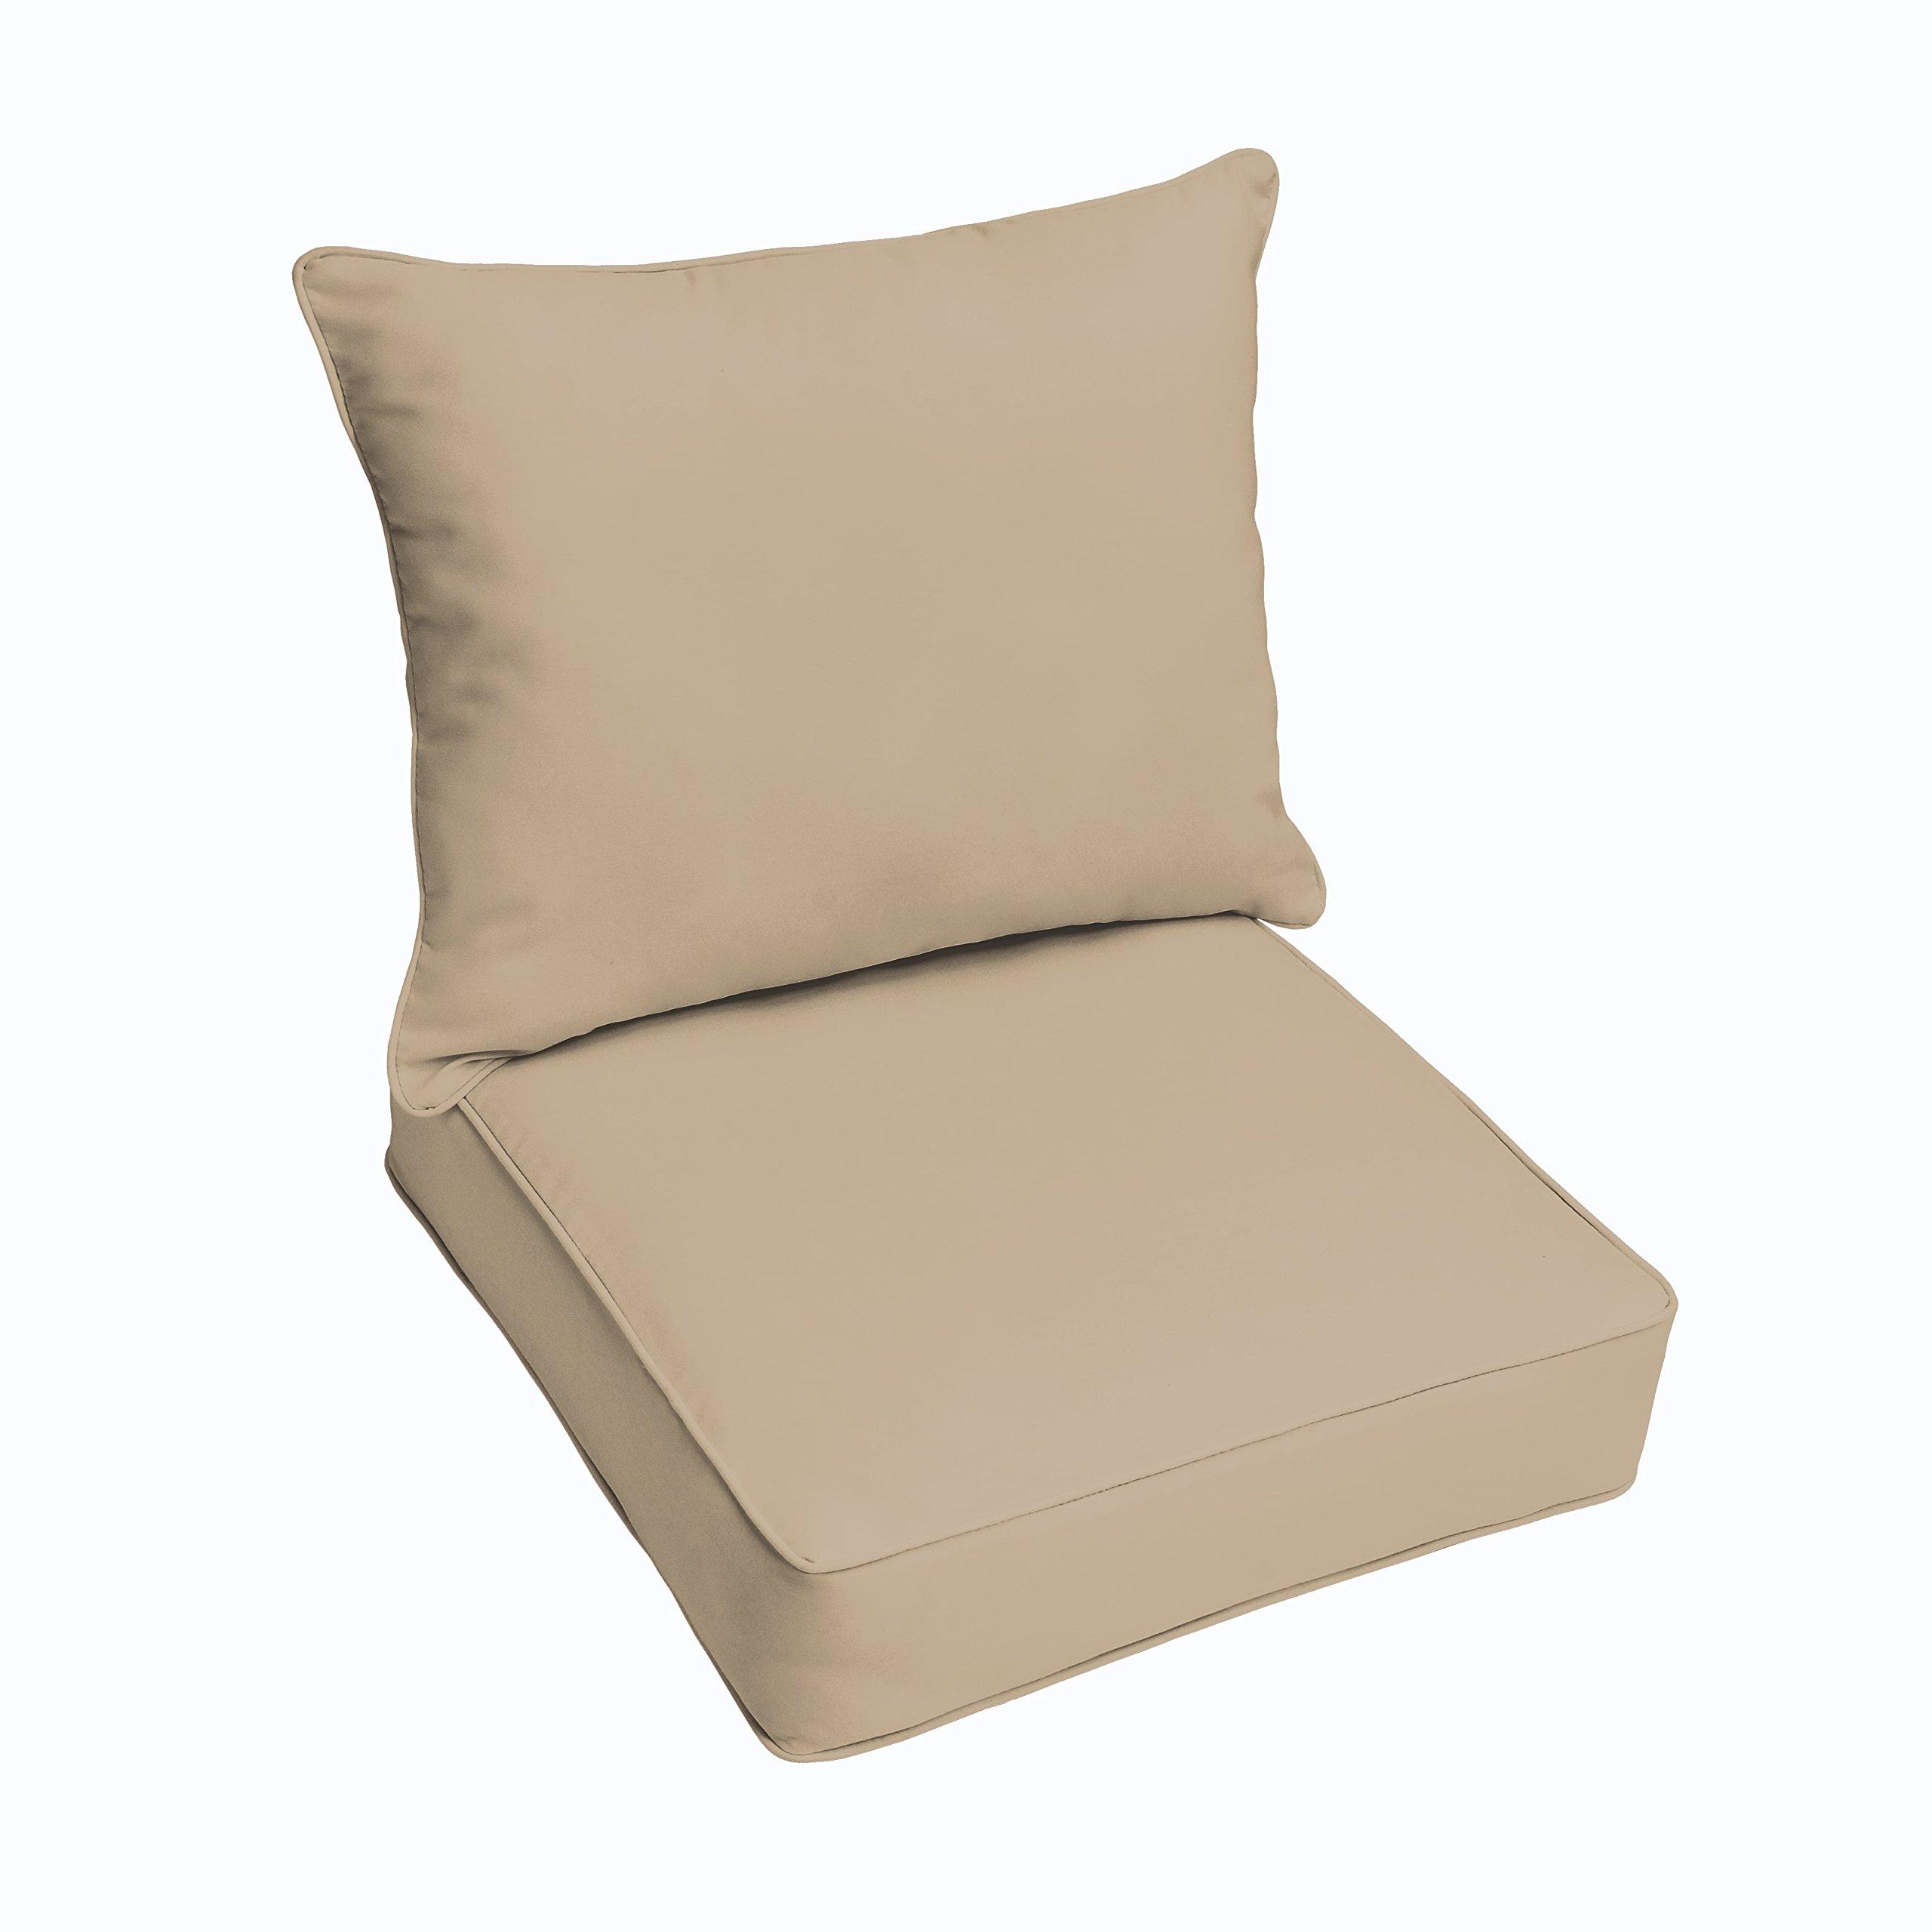 Mozaic Company Sunbrella Canvas Antique Beige 2-piece Cushion and Pillow Indoor/Outdoor Set